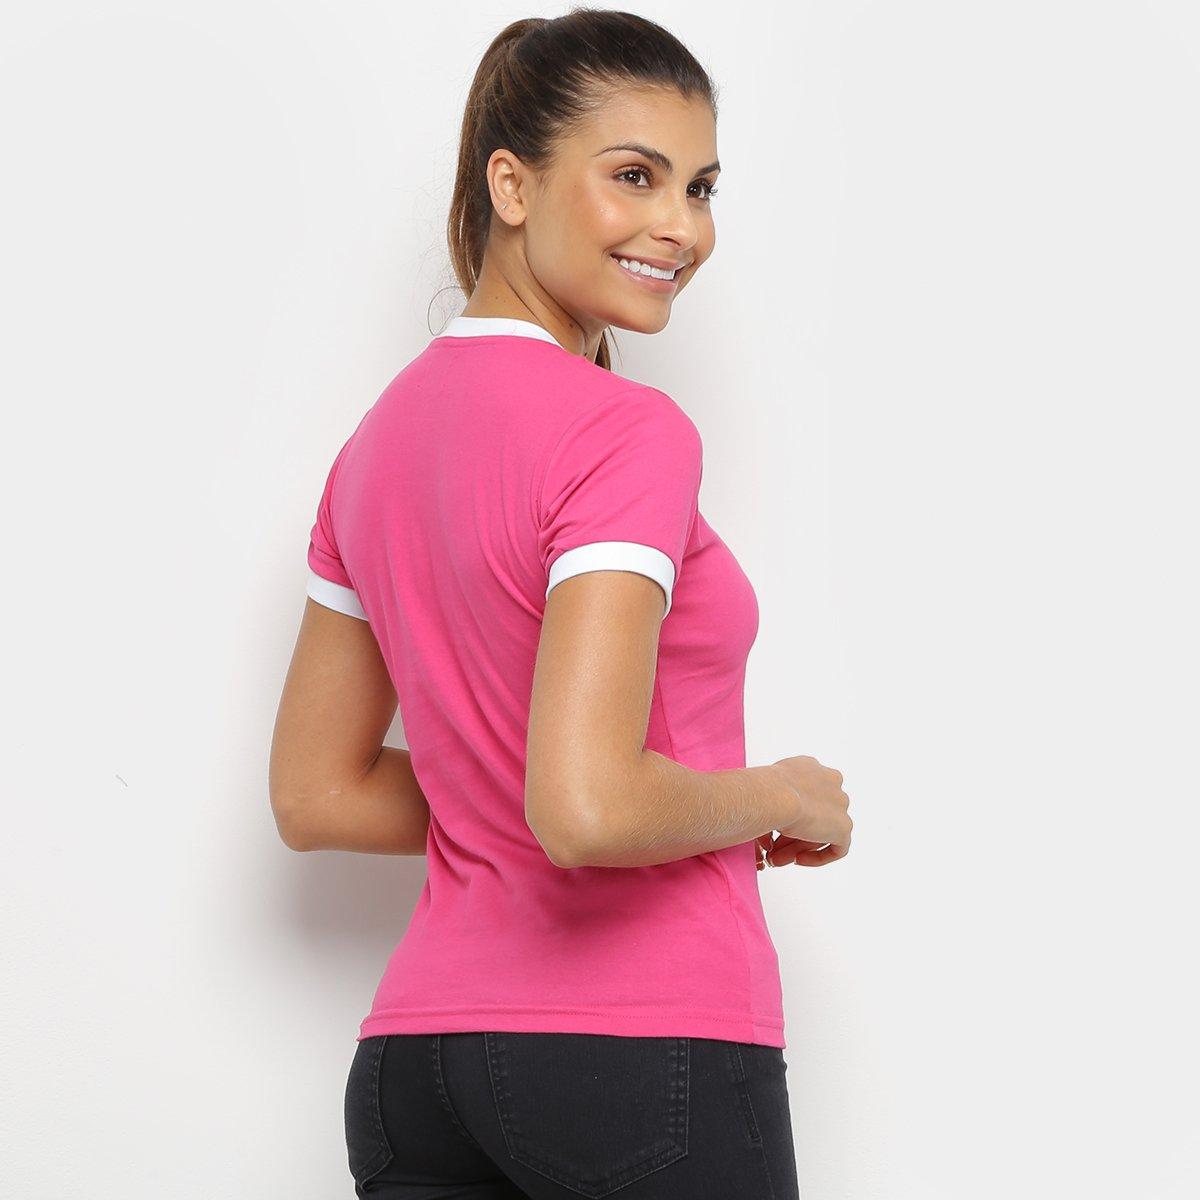 Camisa Internacional Outubro Rosa Retro Mania Feminina Rosa Loja Do Inter